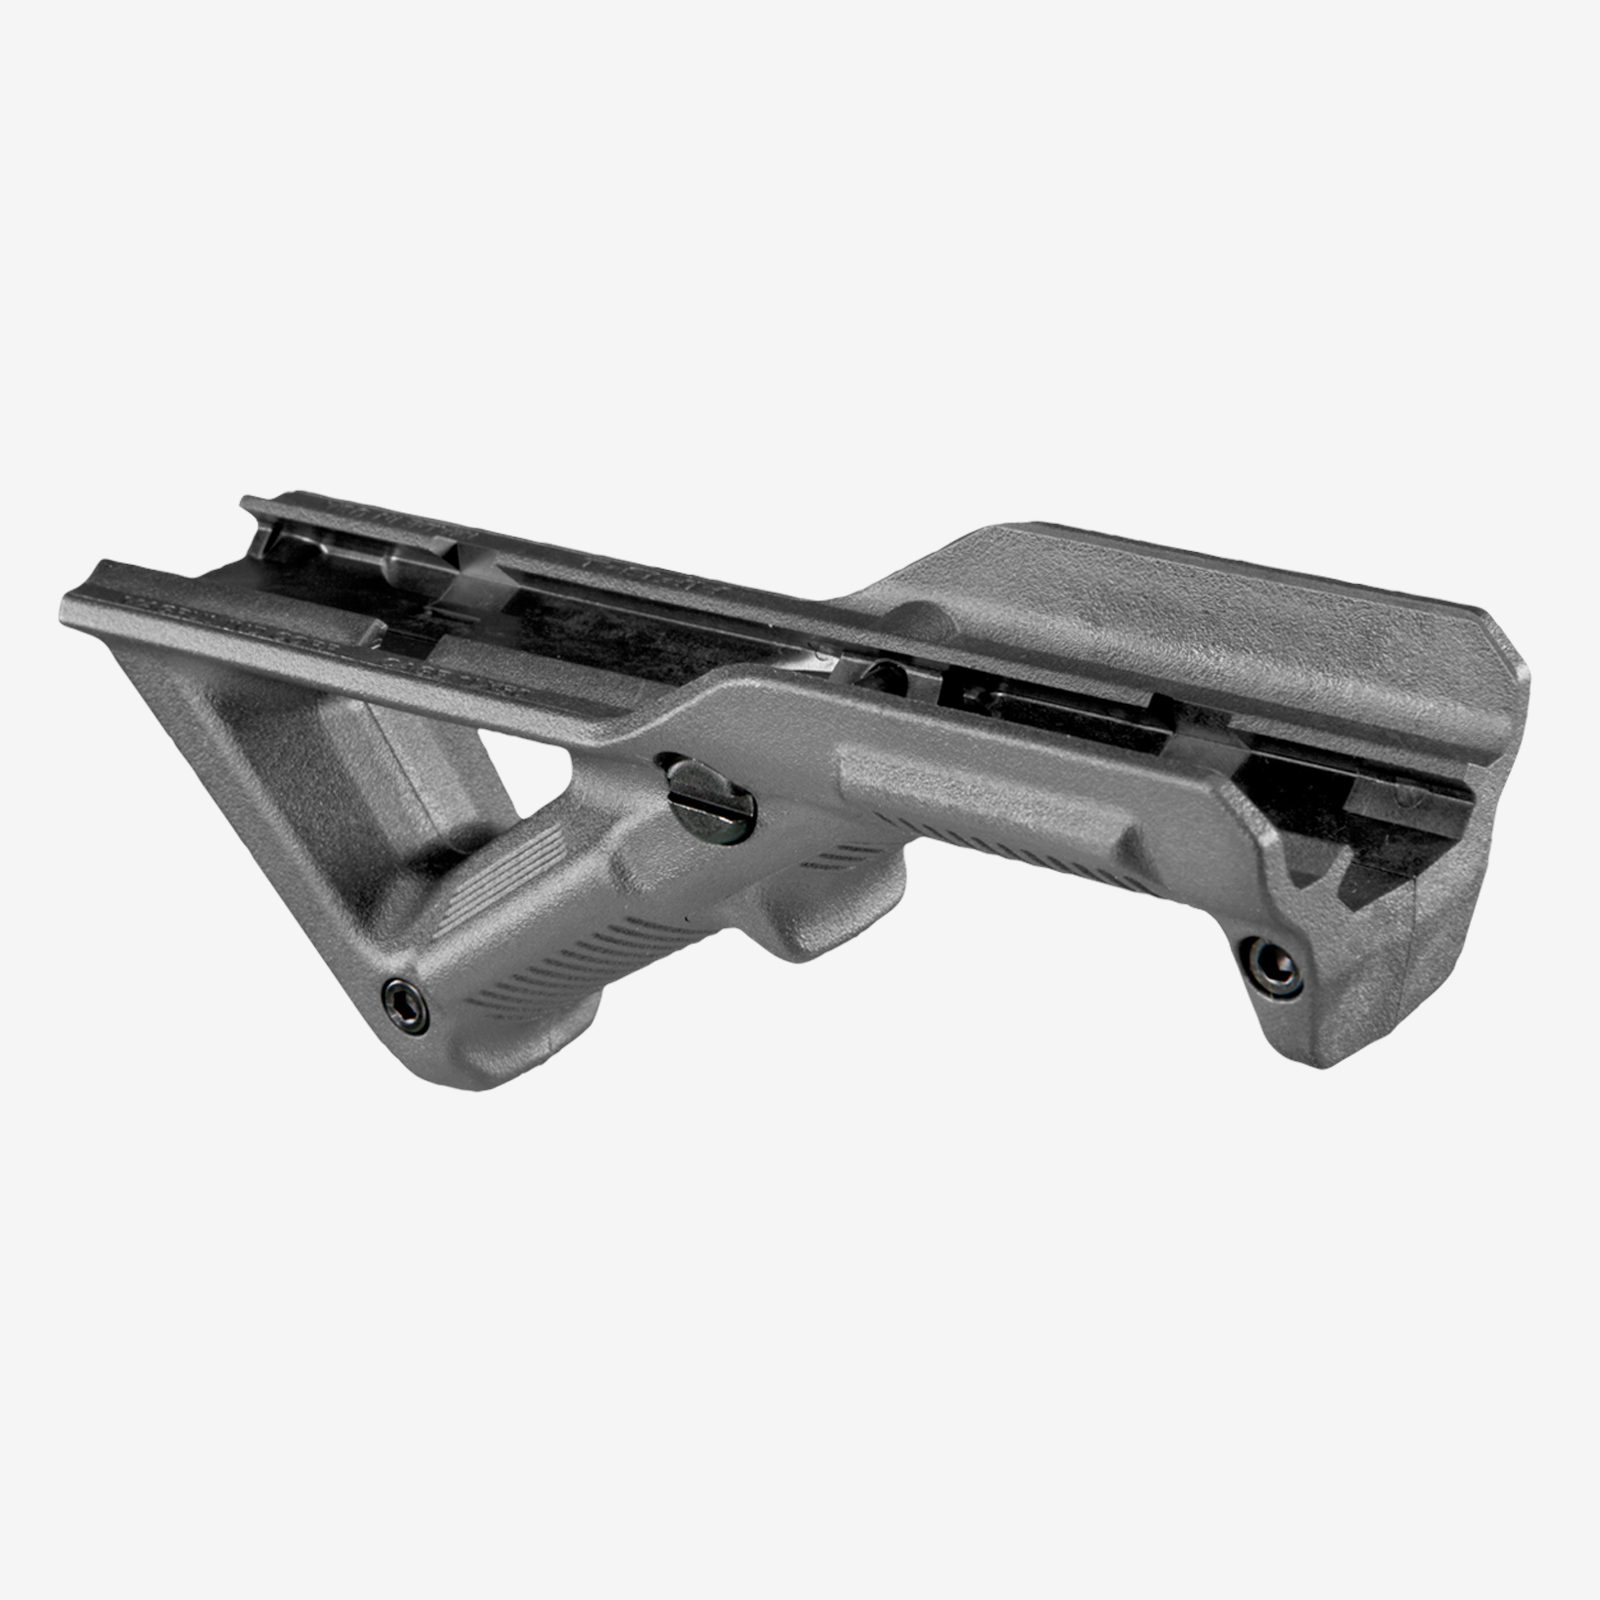 Рукоятка на цевье горизонтальная  MAGPUL AFG®-AngledForeGrip